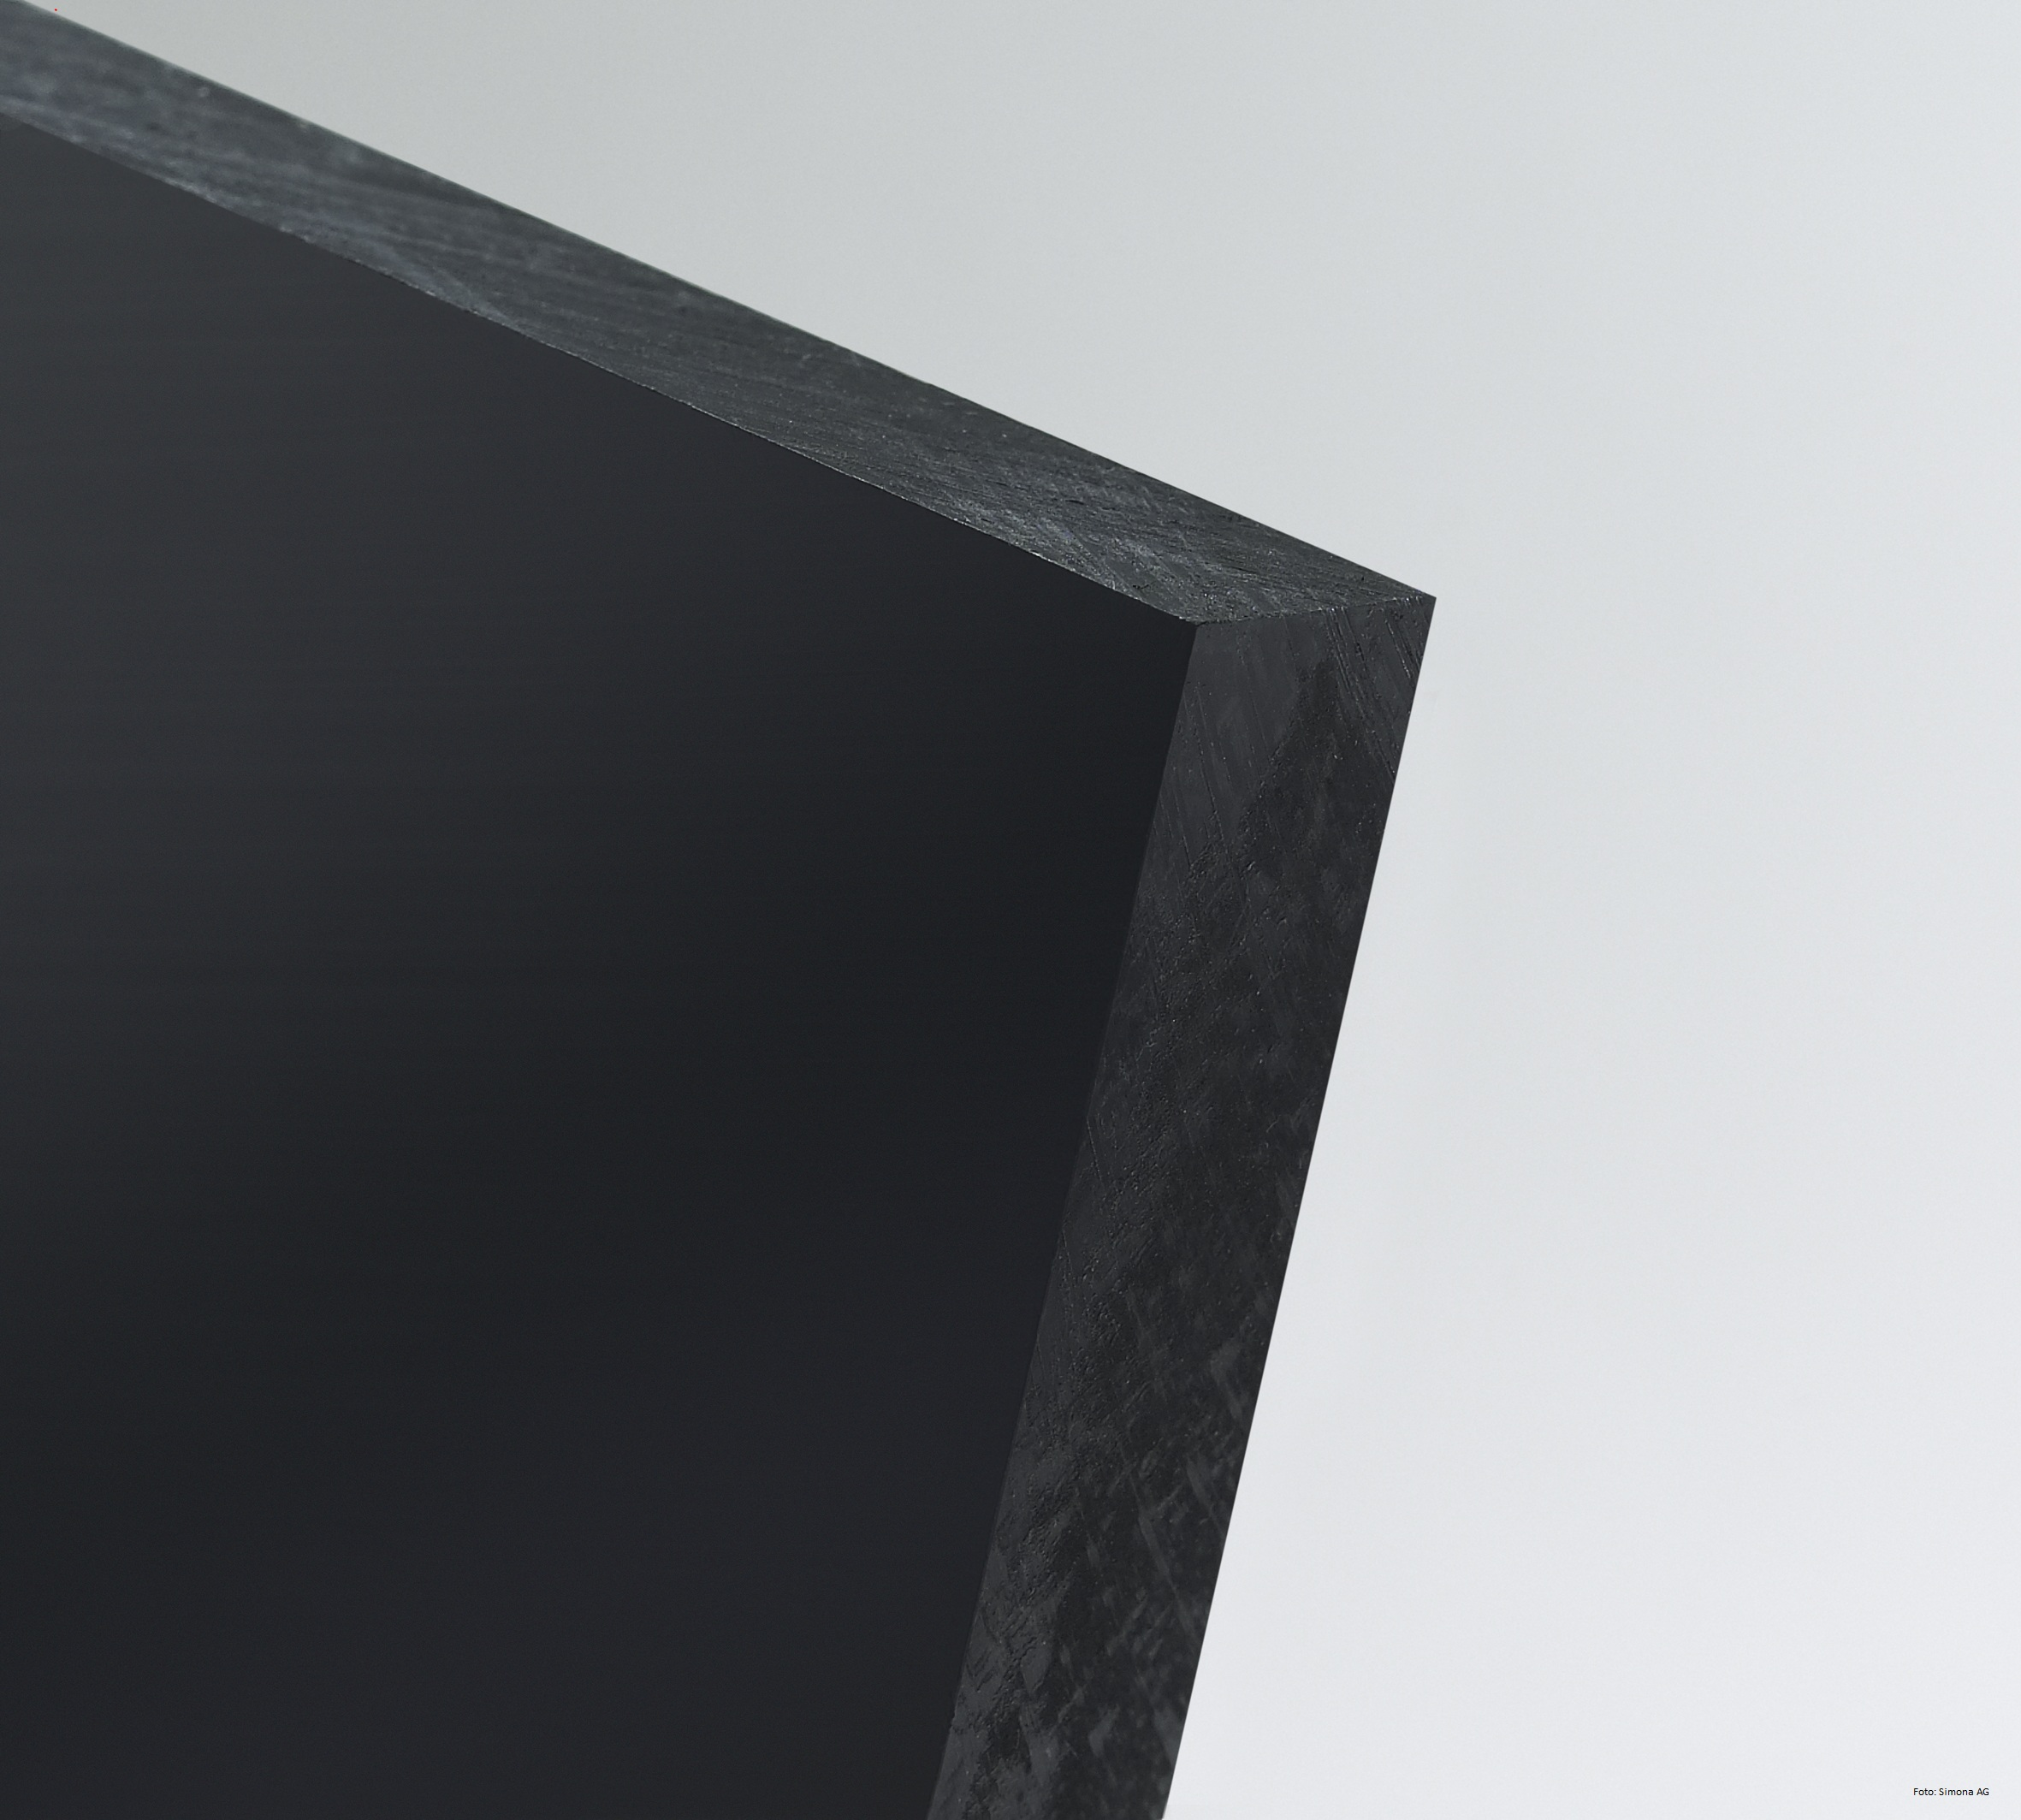 pe hd tafel schwarz extrudiert gro format. Black Bedroom Furniture Sets. Home Design Ideas